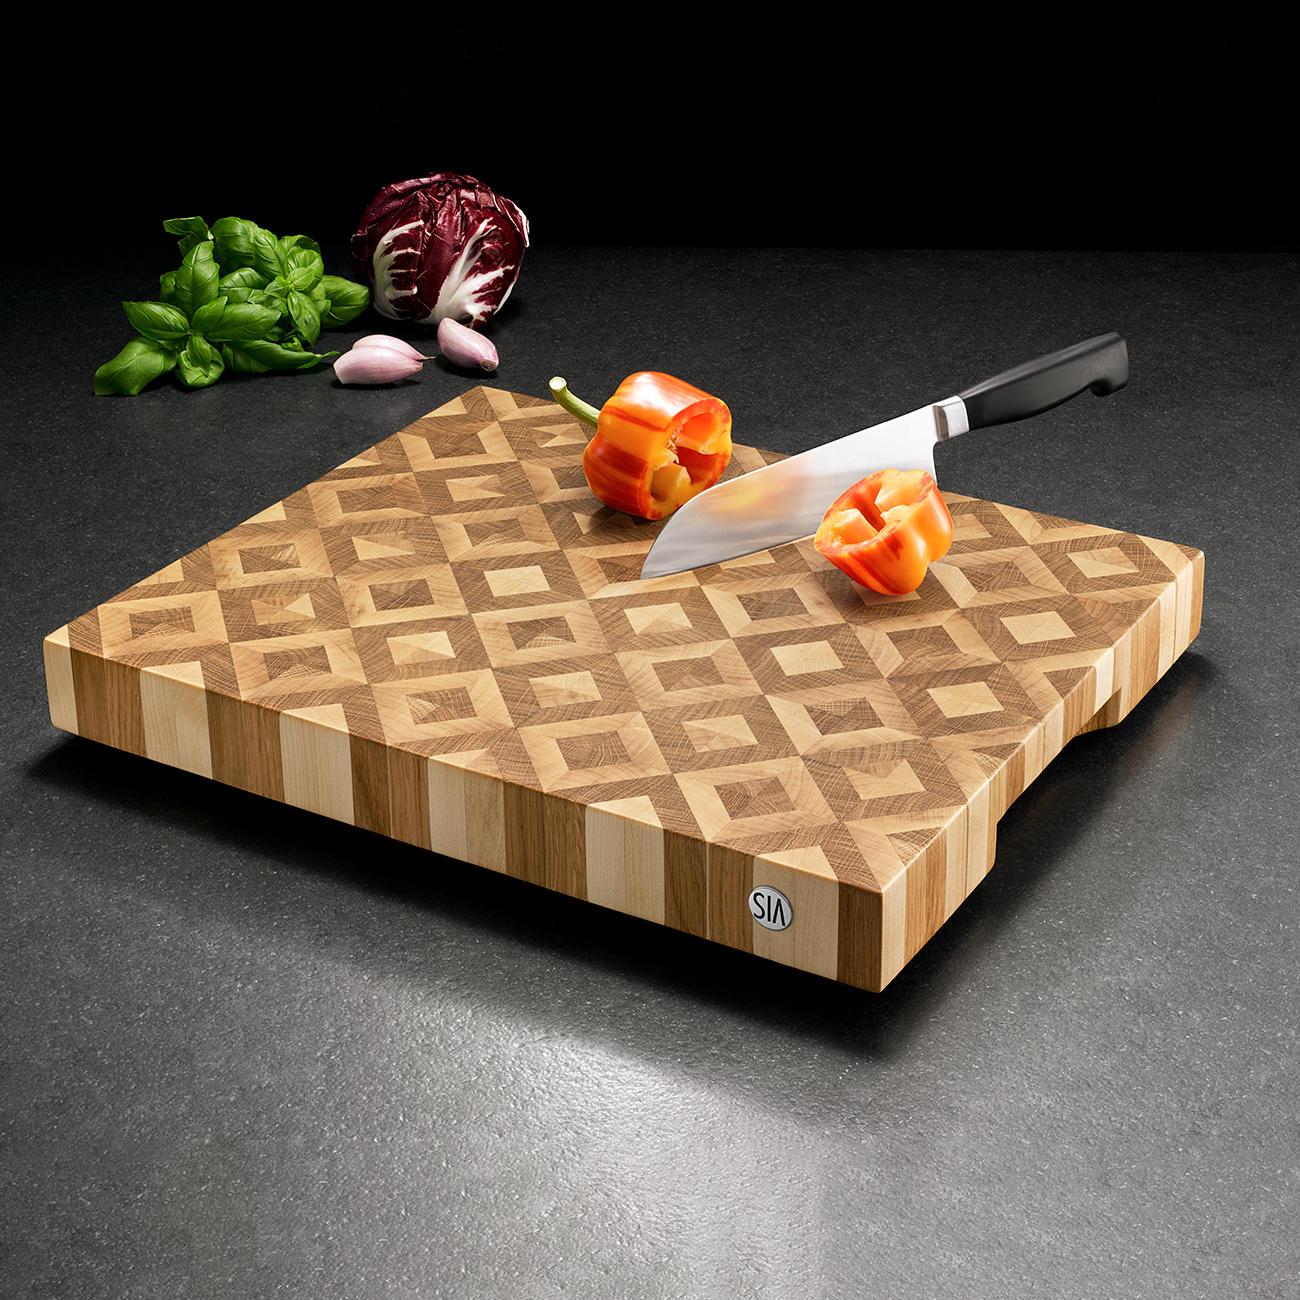 Wood 9 x 12 x 16 cm Brown Zassenhaus Breakfast Board Set